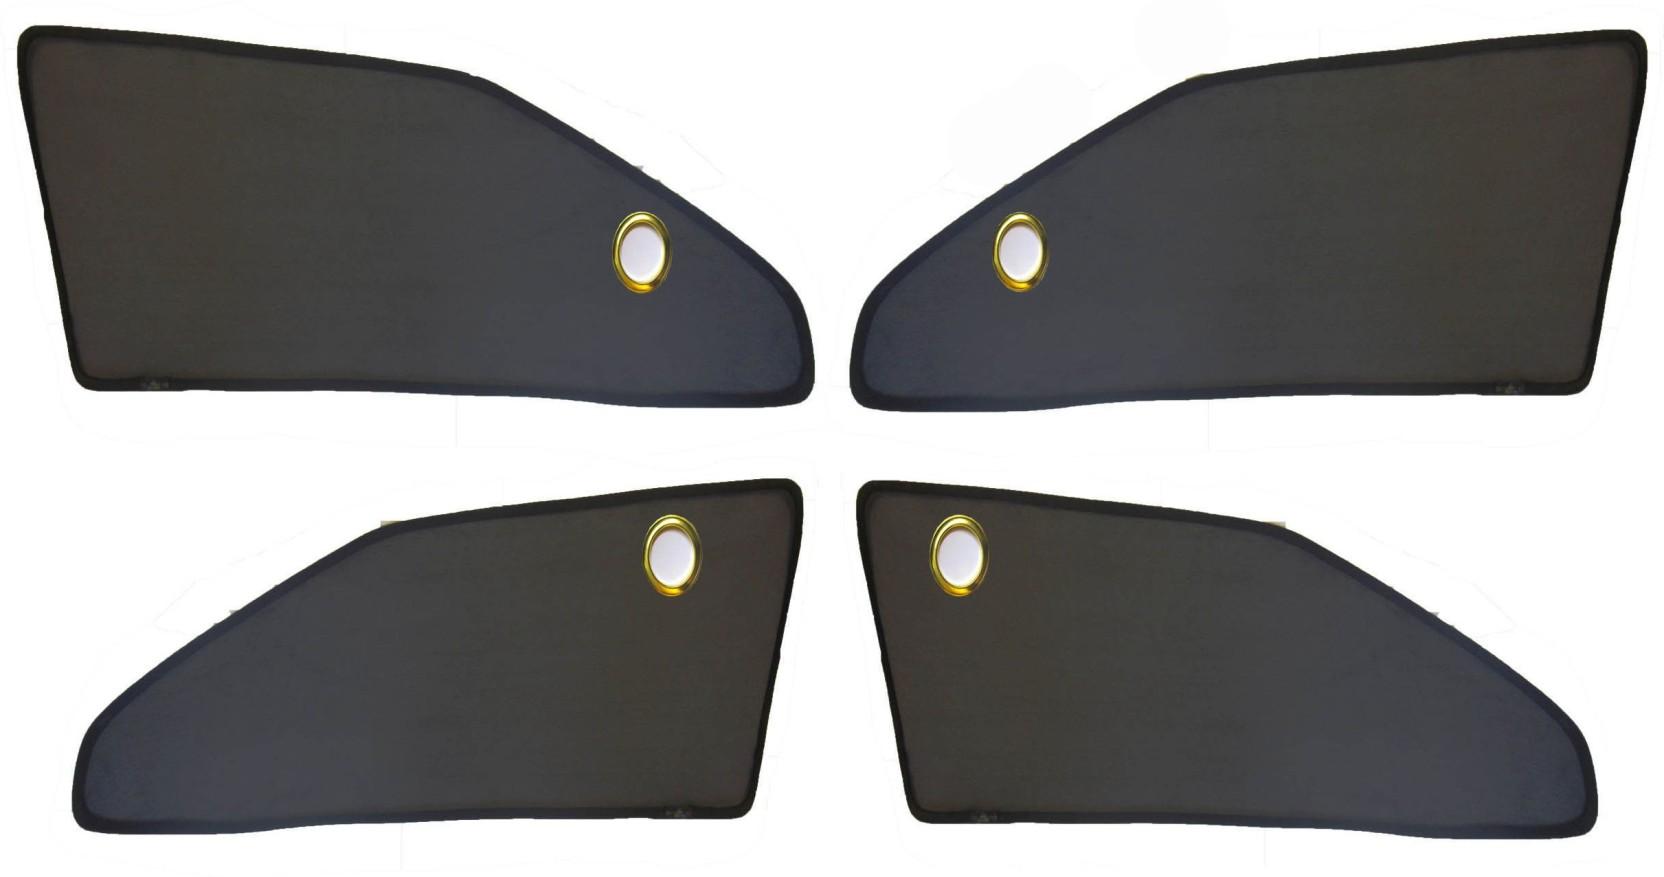 MAGNET Side Window Sun Shade For Maruti Suzuki Zen (Black)